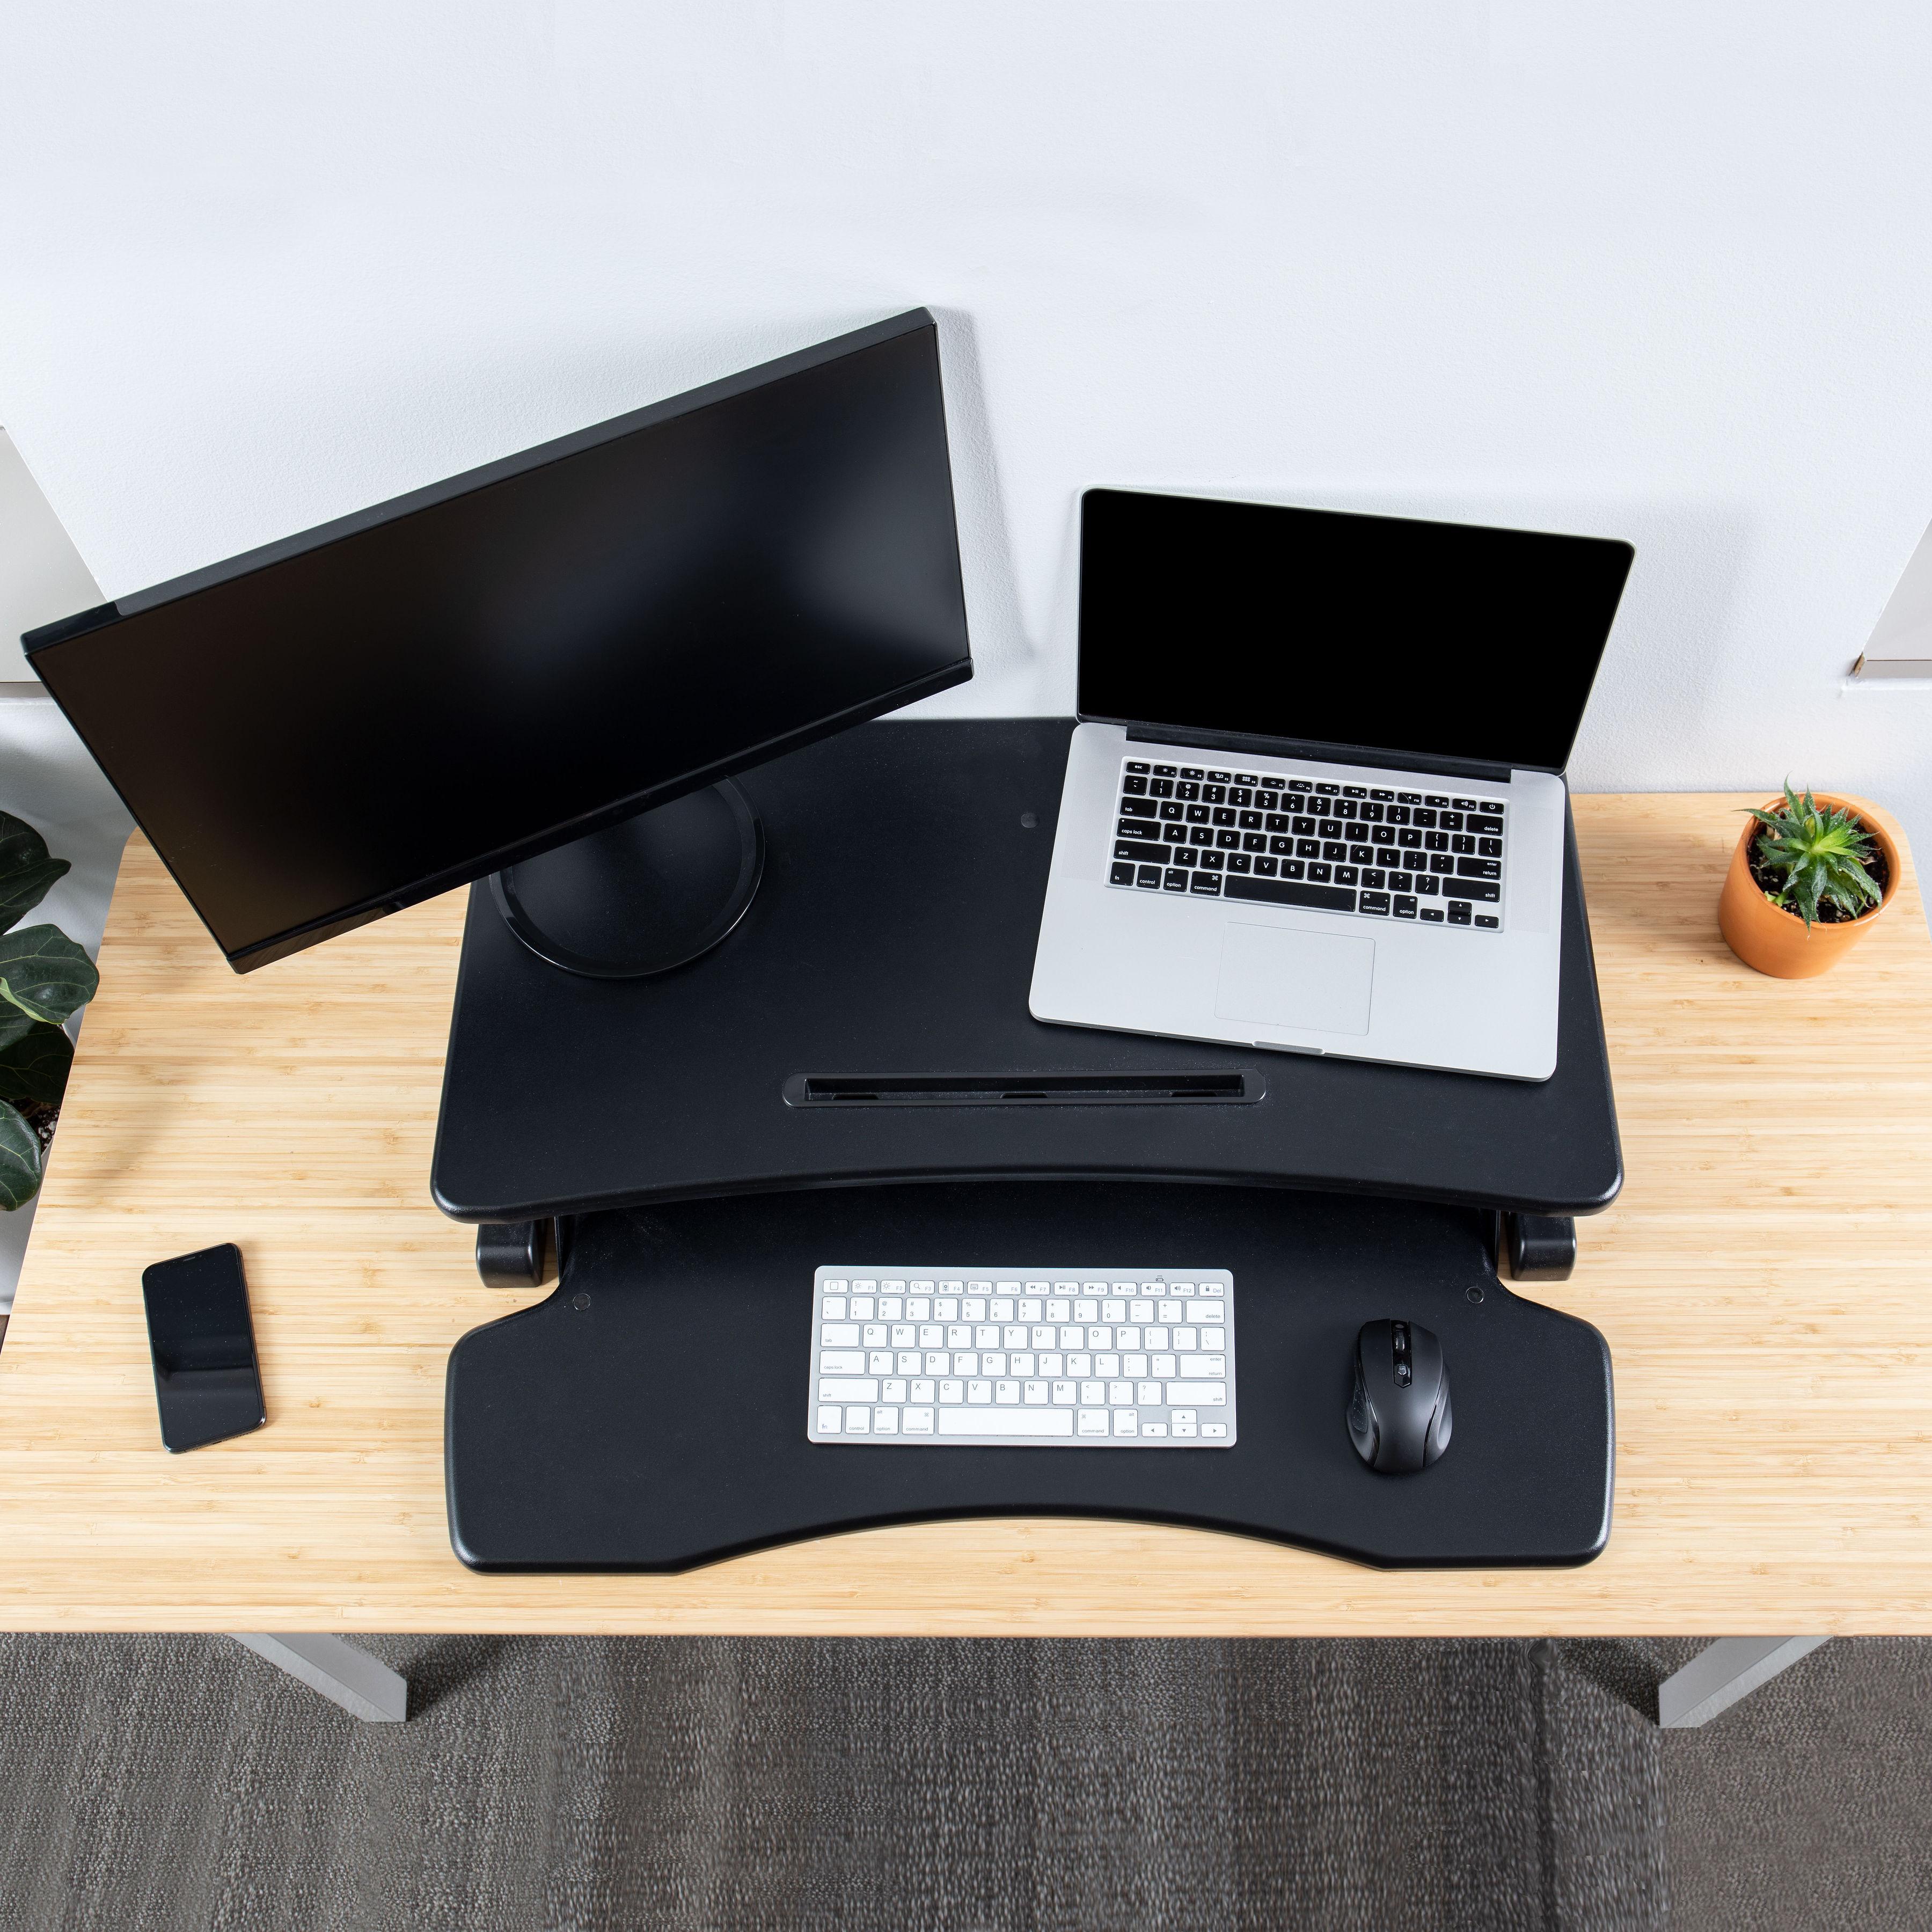 Rise-X-Light-Standing-Desk-Stand-Up-Desk-Height-Adjustable-Desk-Converter thumbnail 11